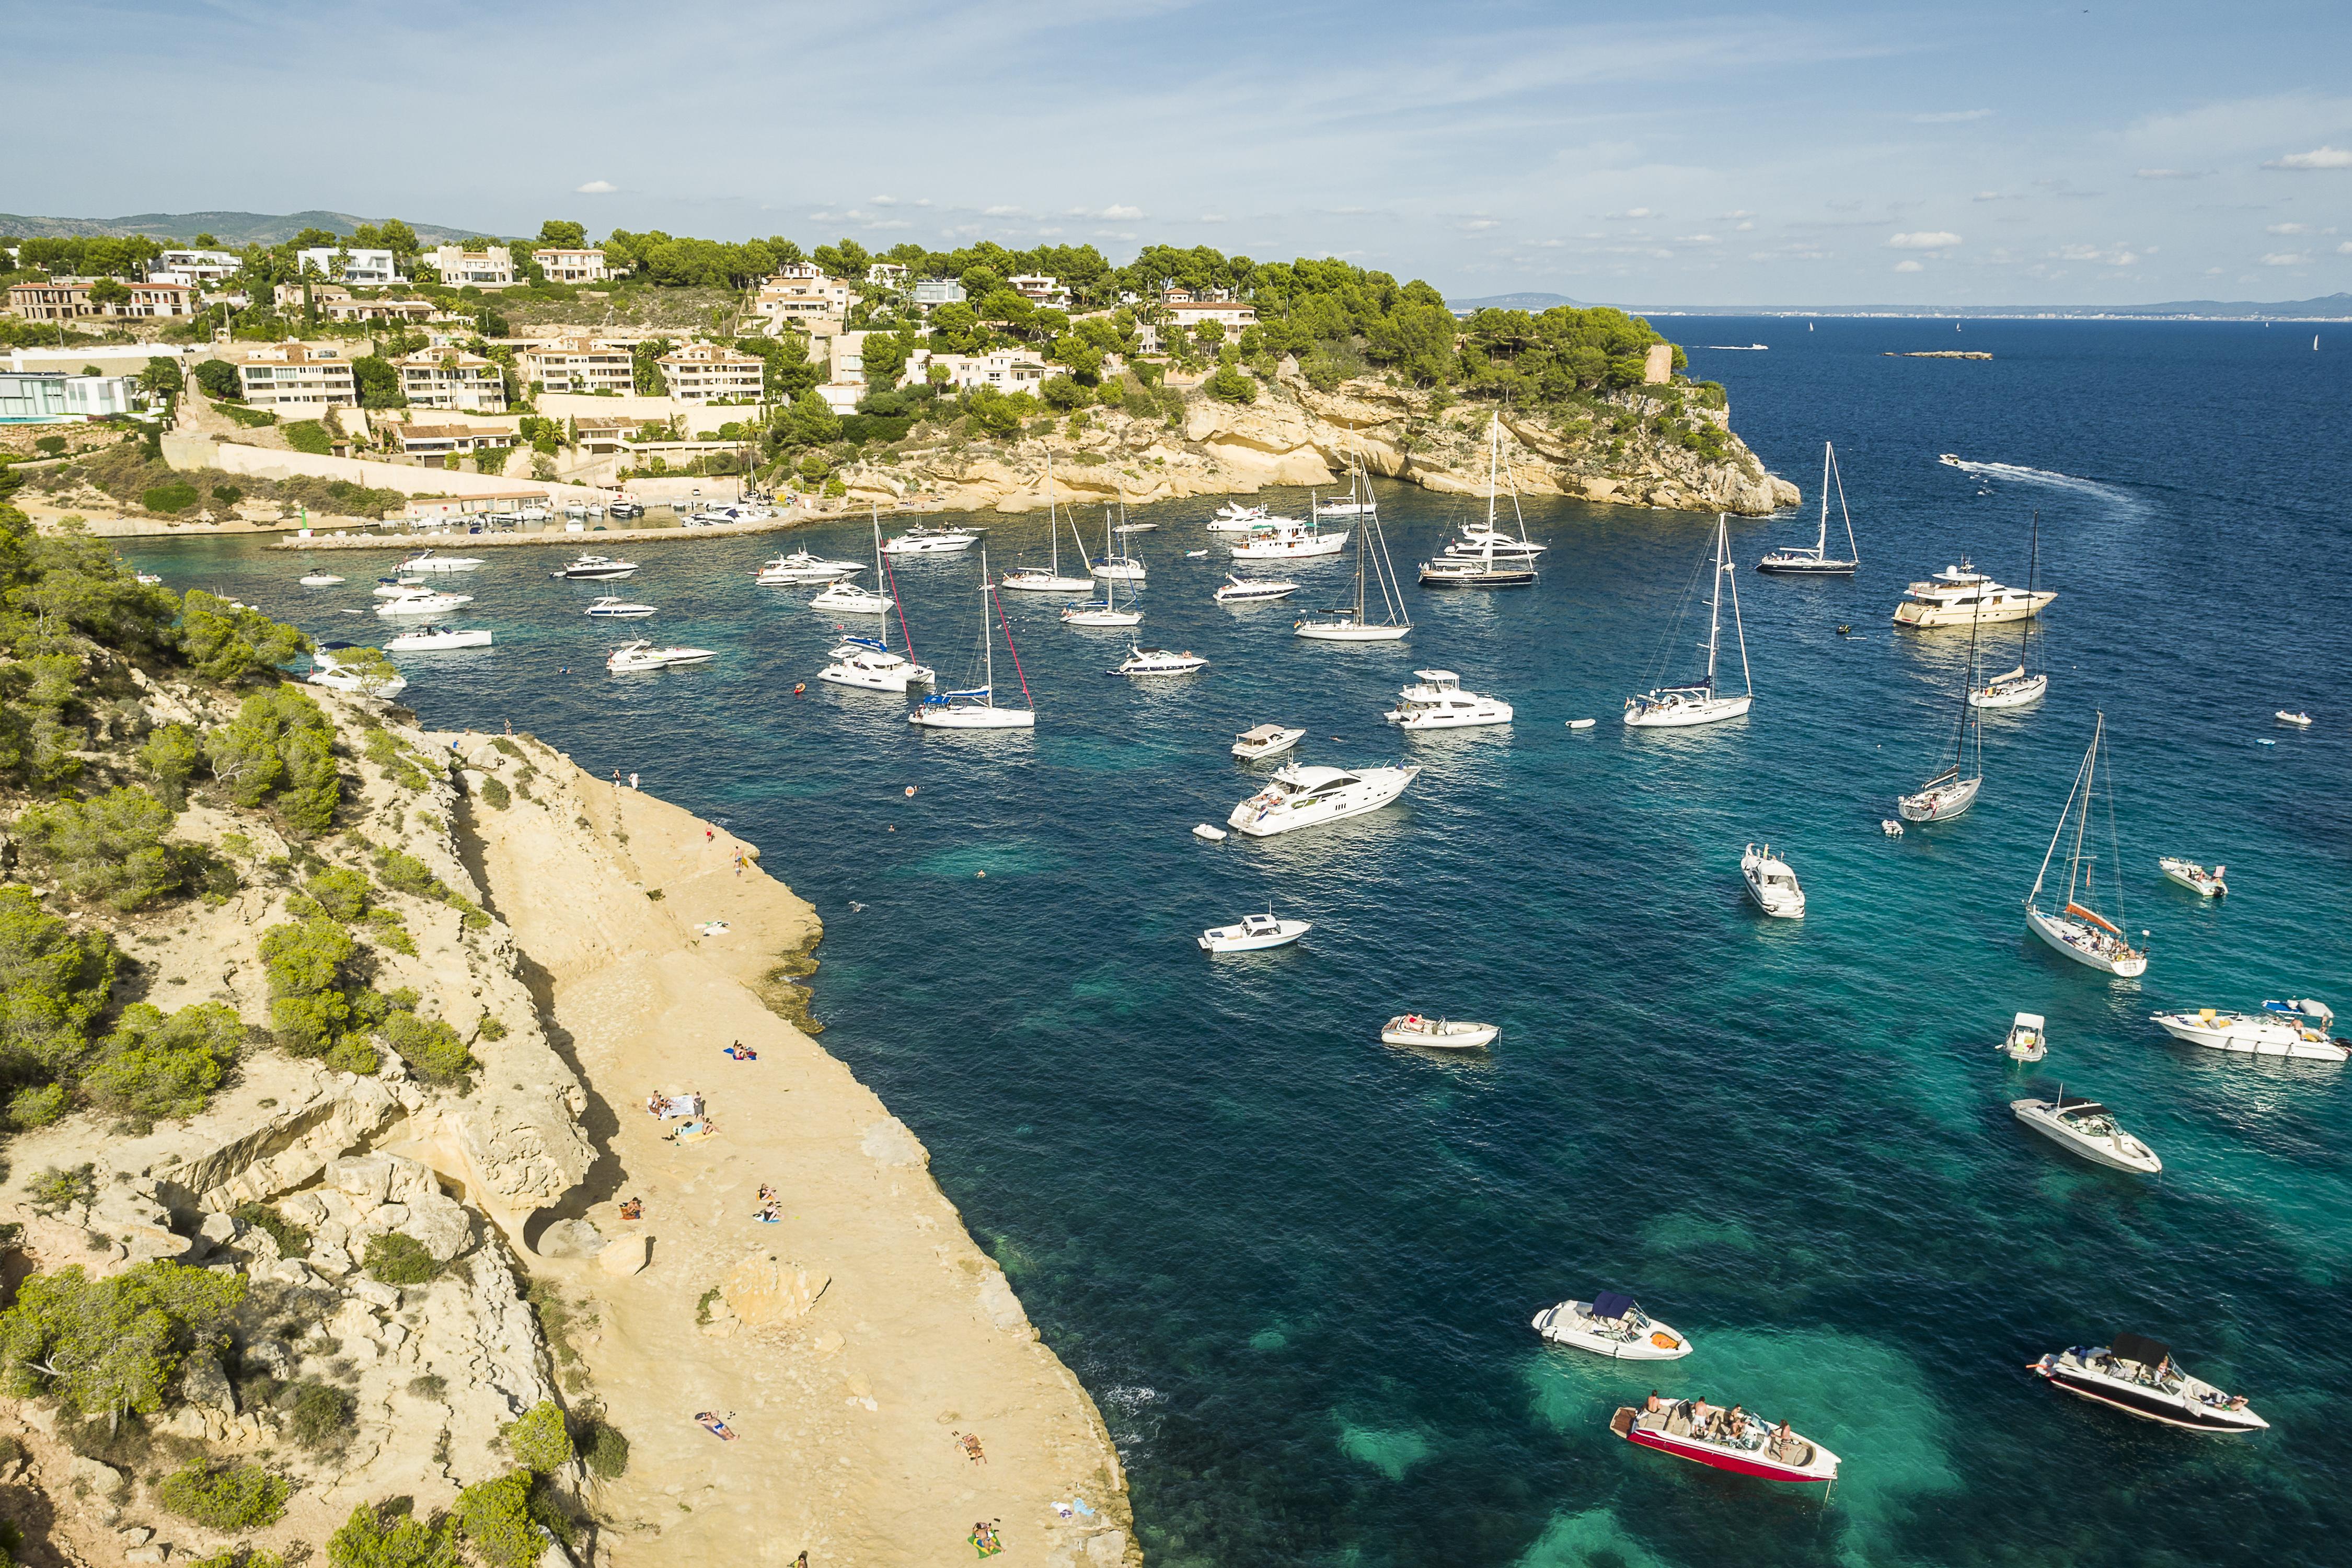 Palma de Mallorca (Moorings)